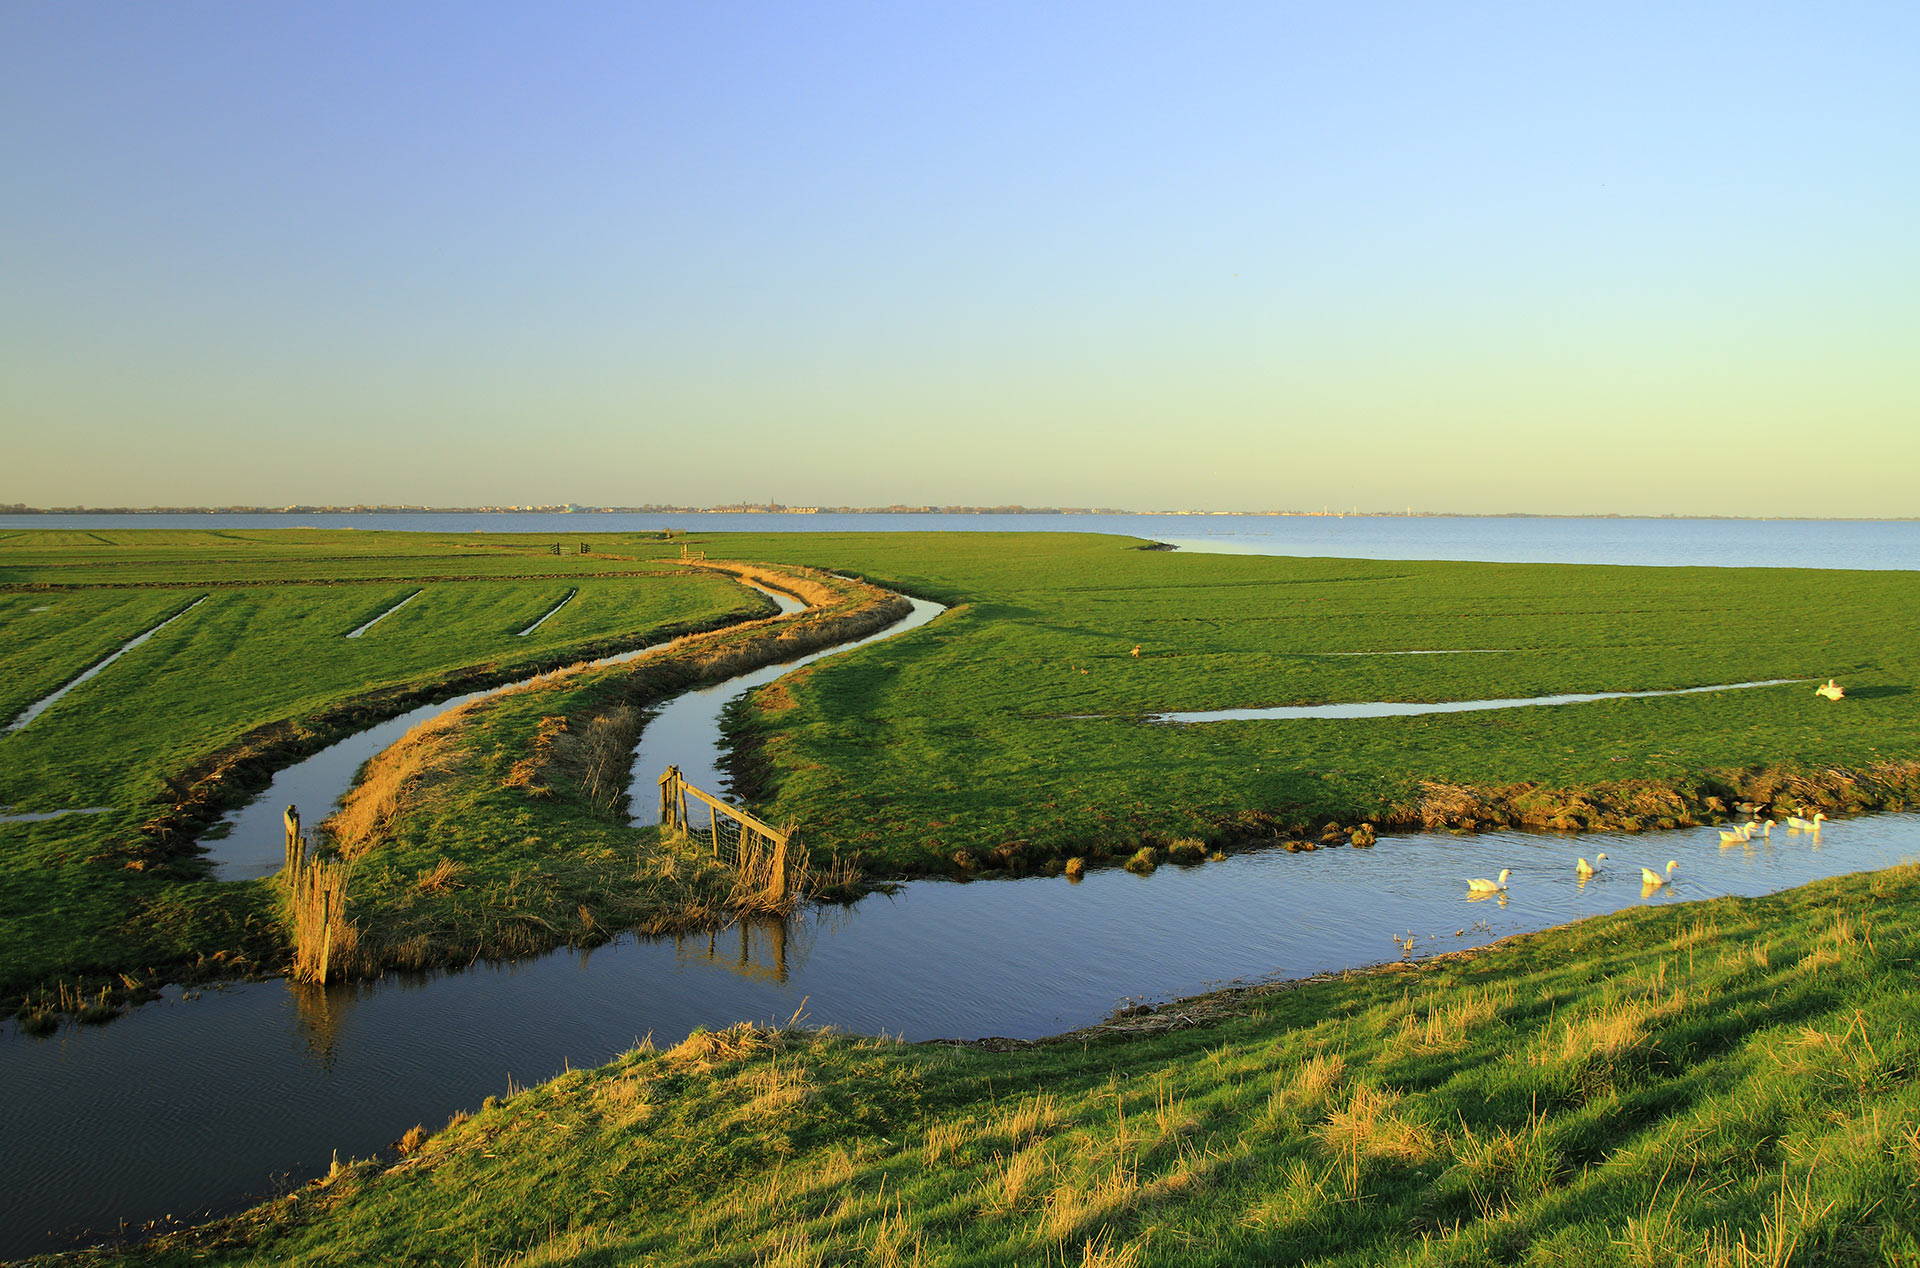 Achtergrond afbeelding: Oostende